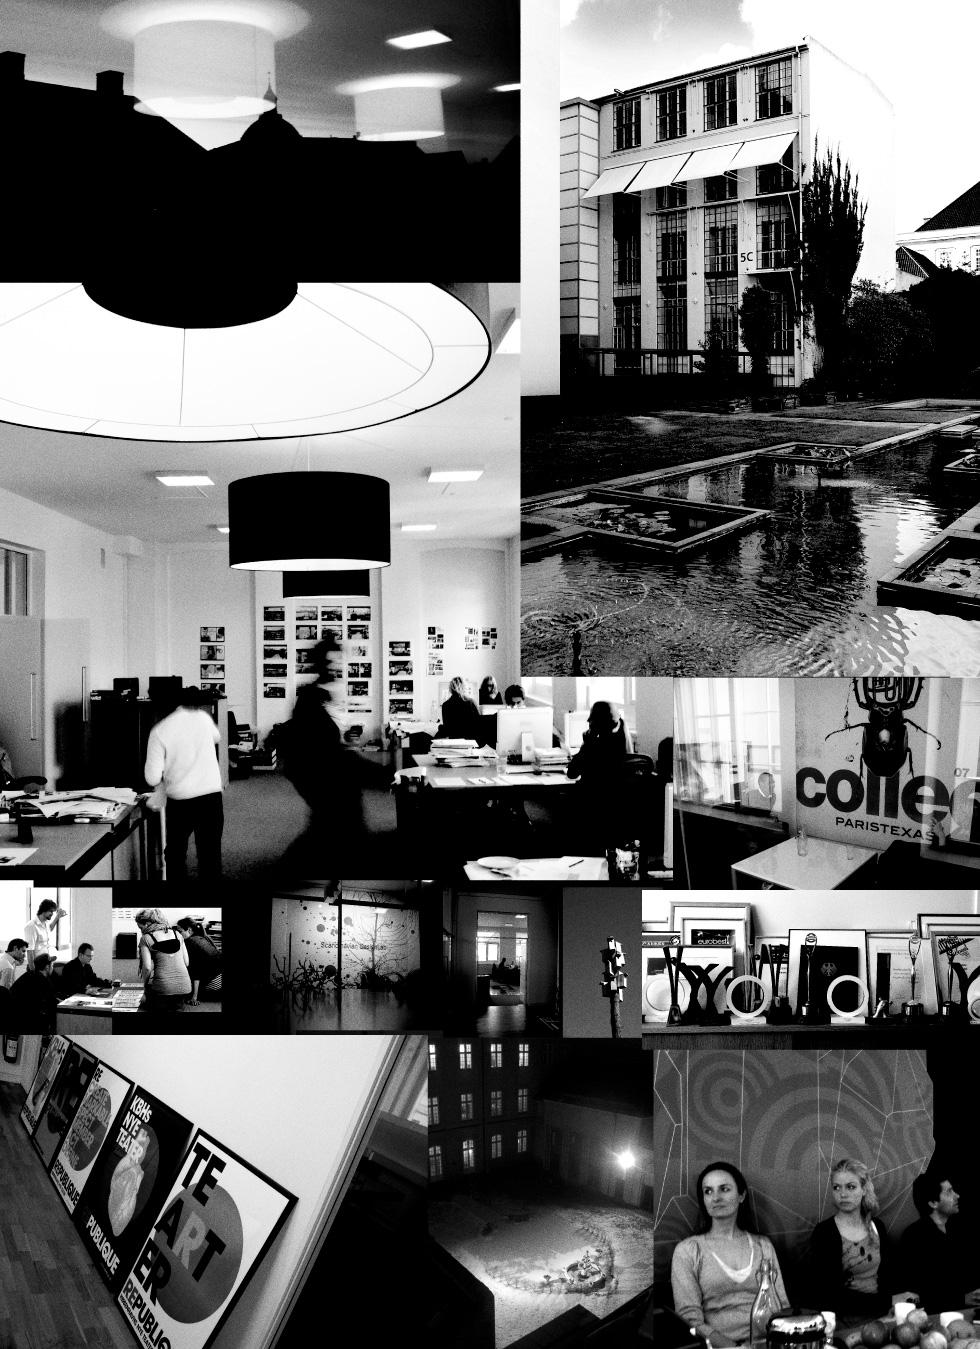 About scandinavian designlab for Scandinavian design philosophy